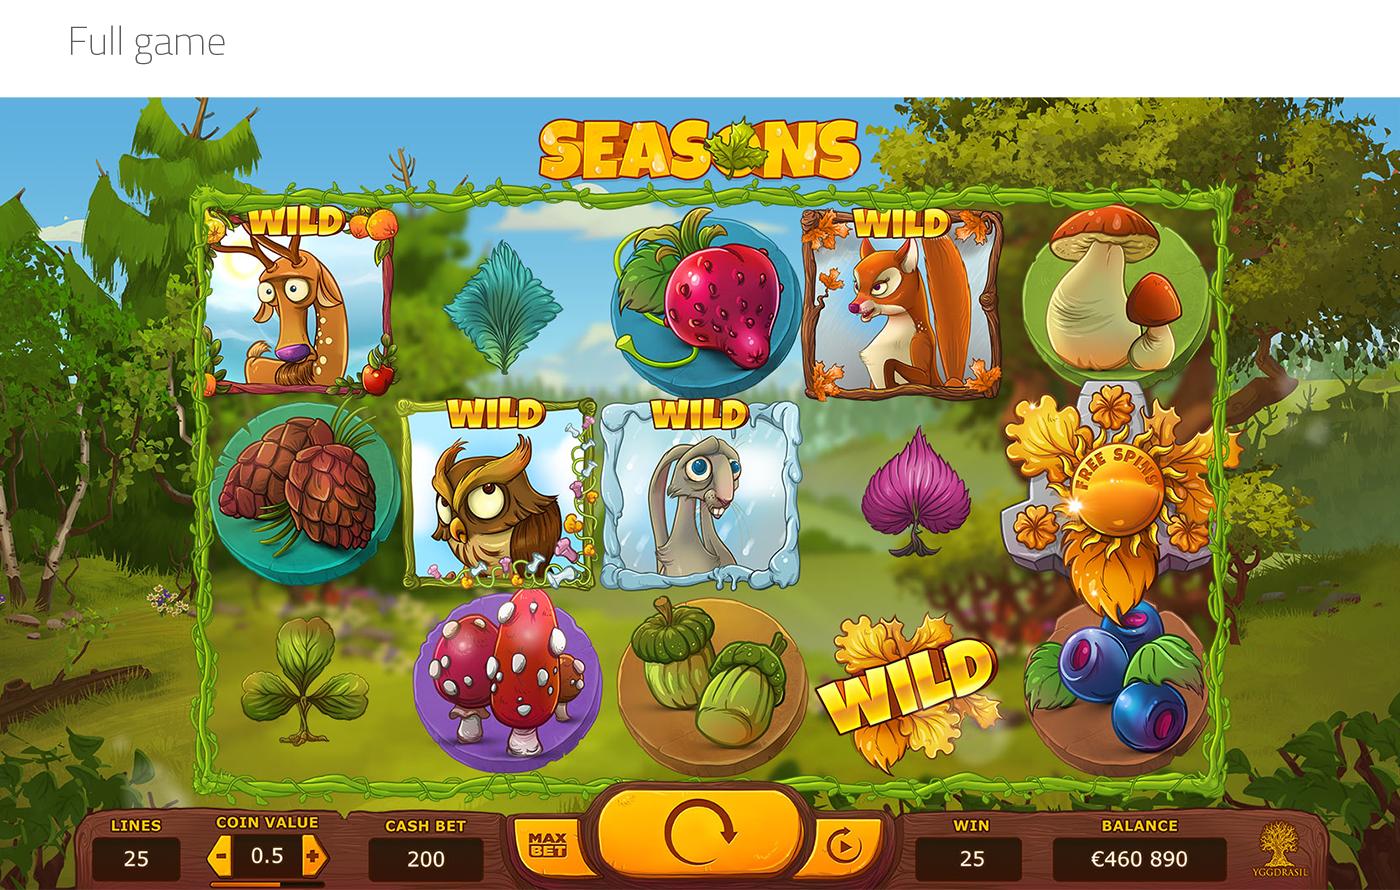 Casino games Slots Game casino Online Games gambling Games iGaming